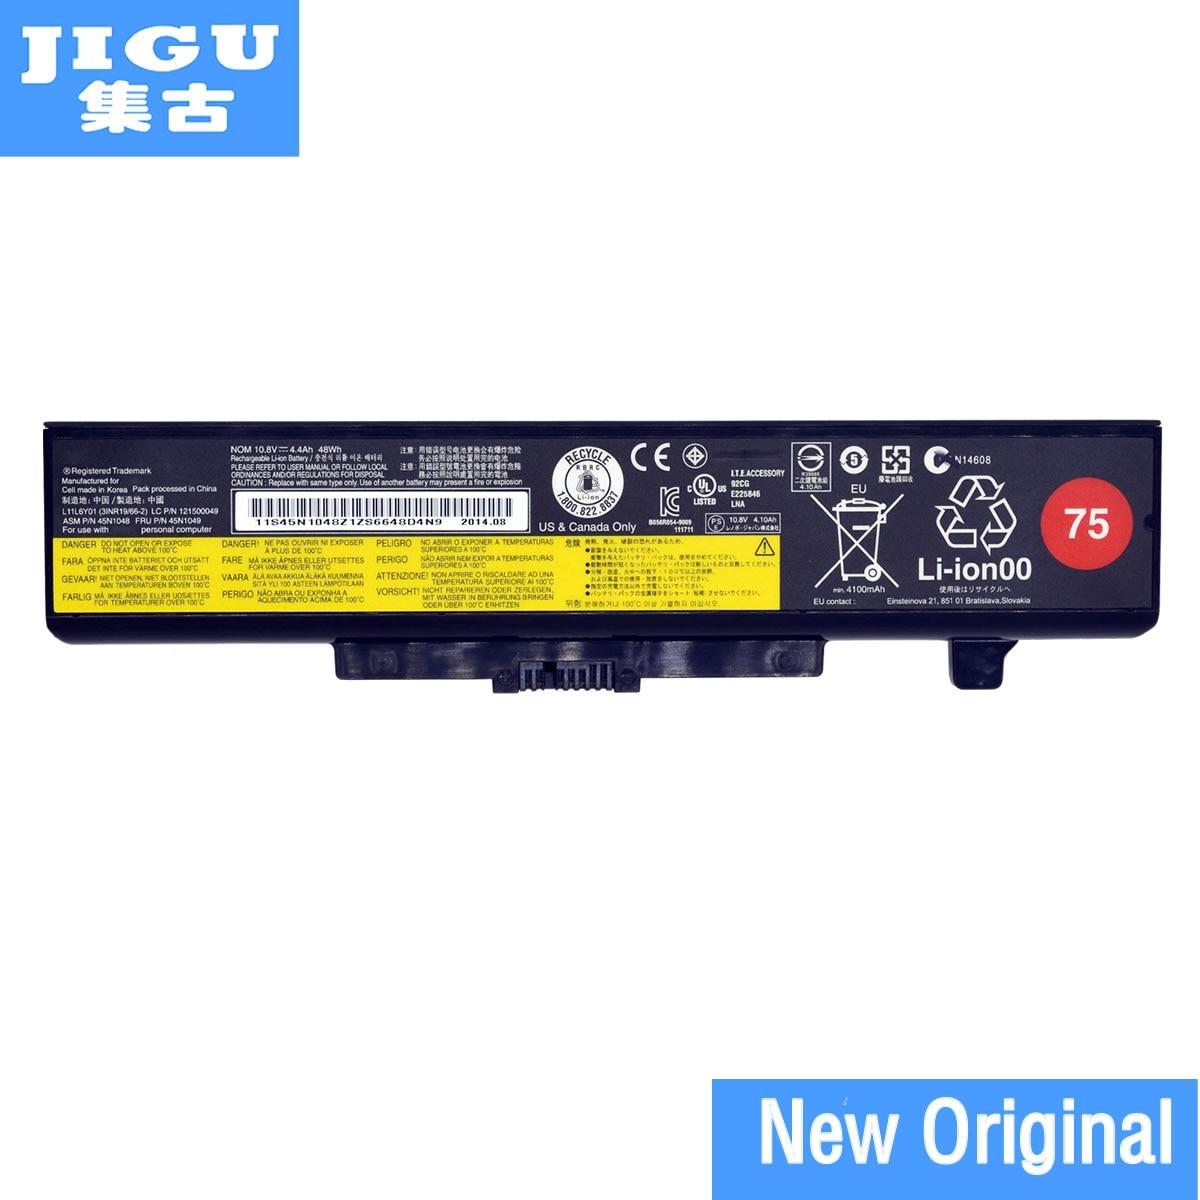 JIGU Original Laptop Battery For Lenovo V580 V580C Y480 Y480P Y485 Y580 Y580A Z380 Z480 Z485 Z580 Z585 V480S V480u